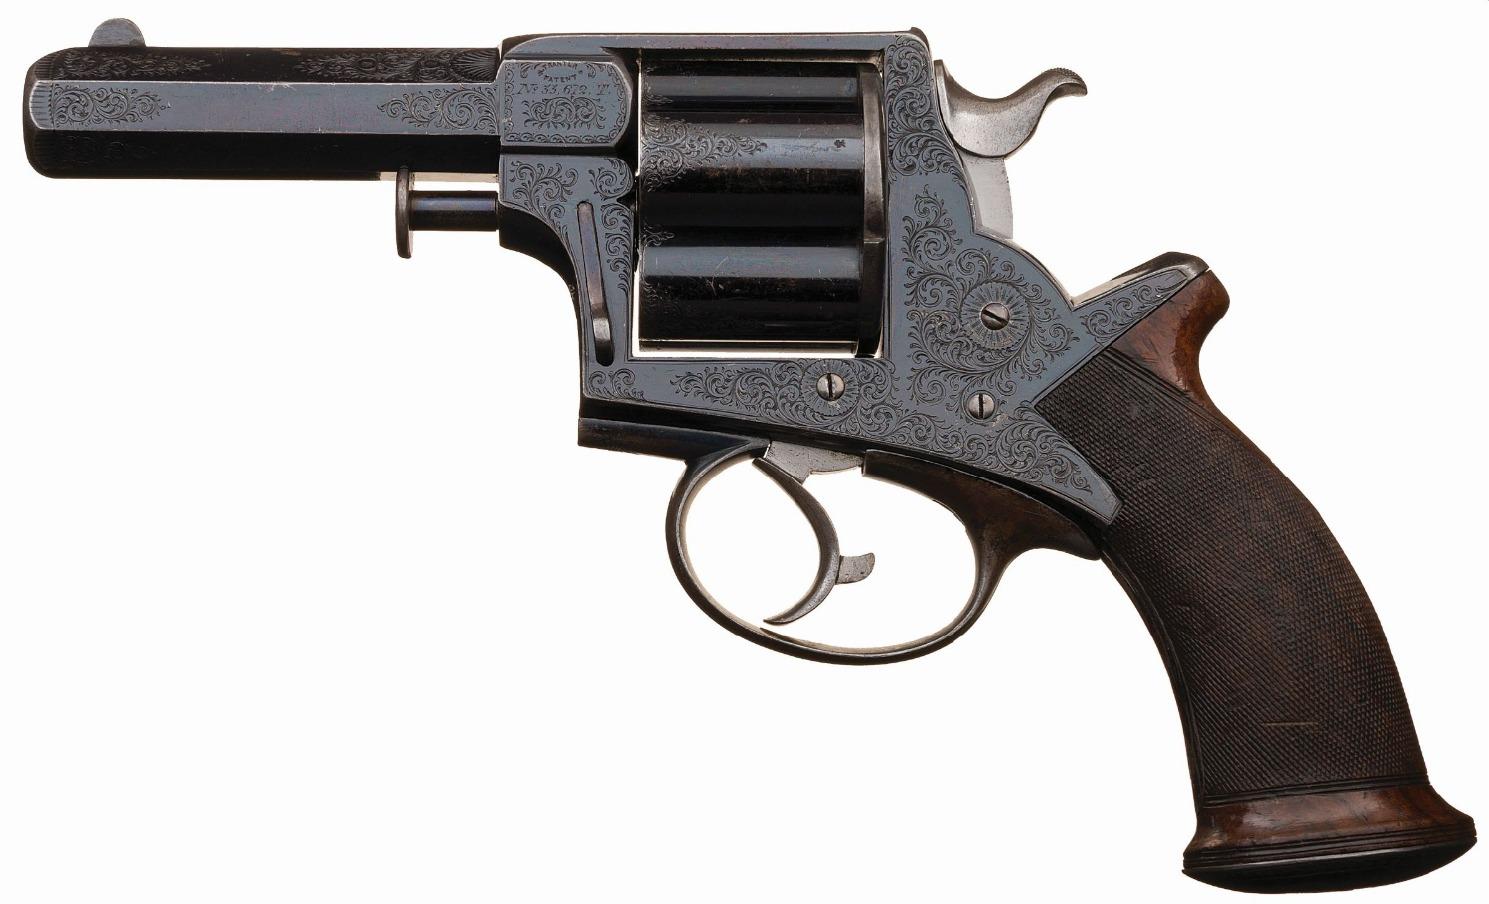 Tranter Manstopper revolver